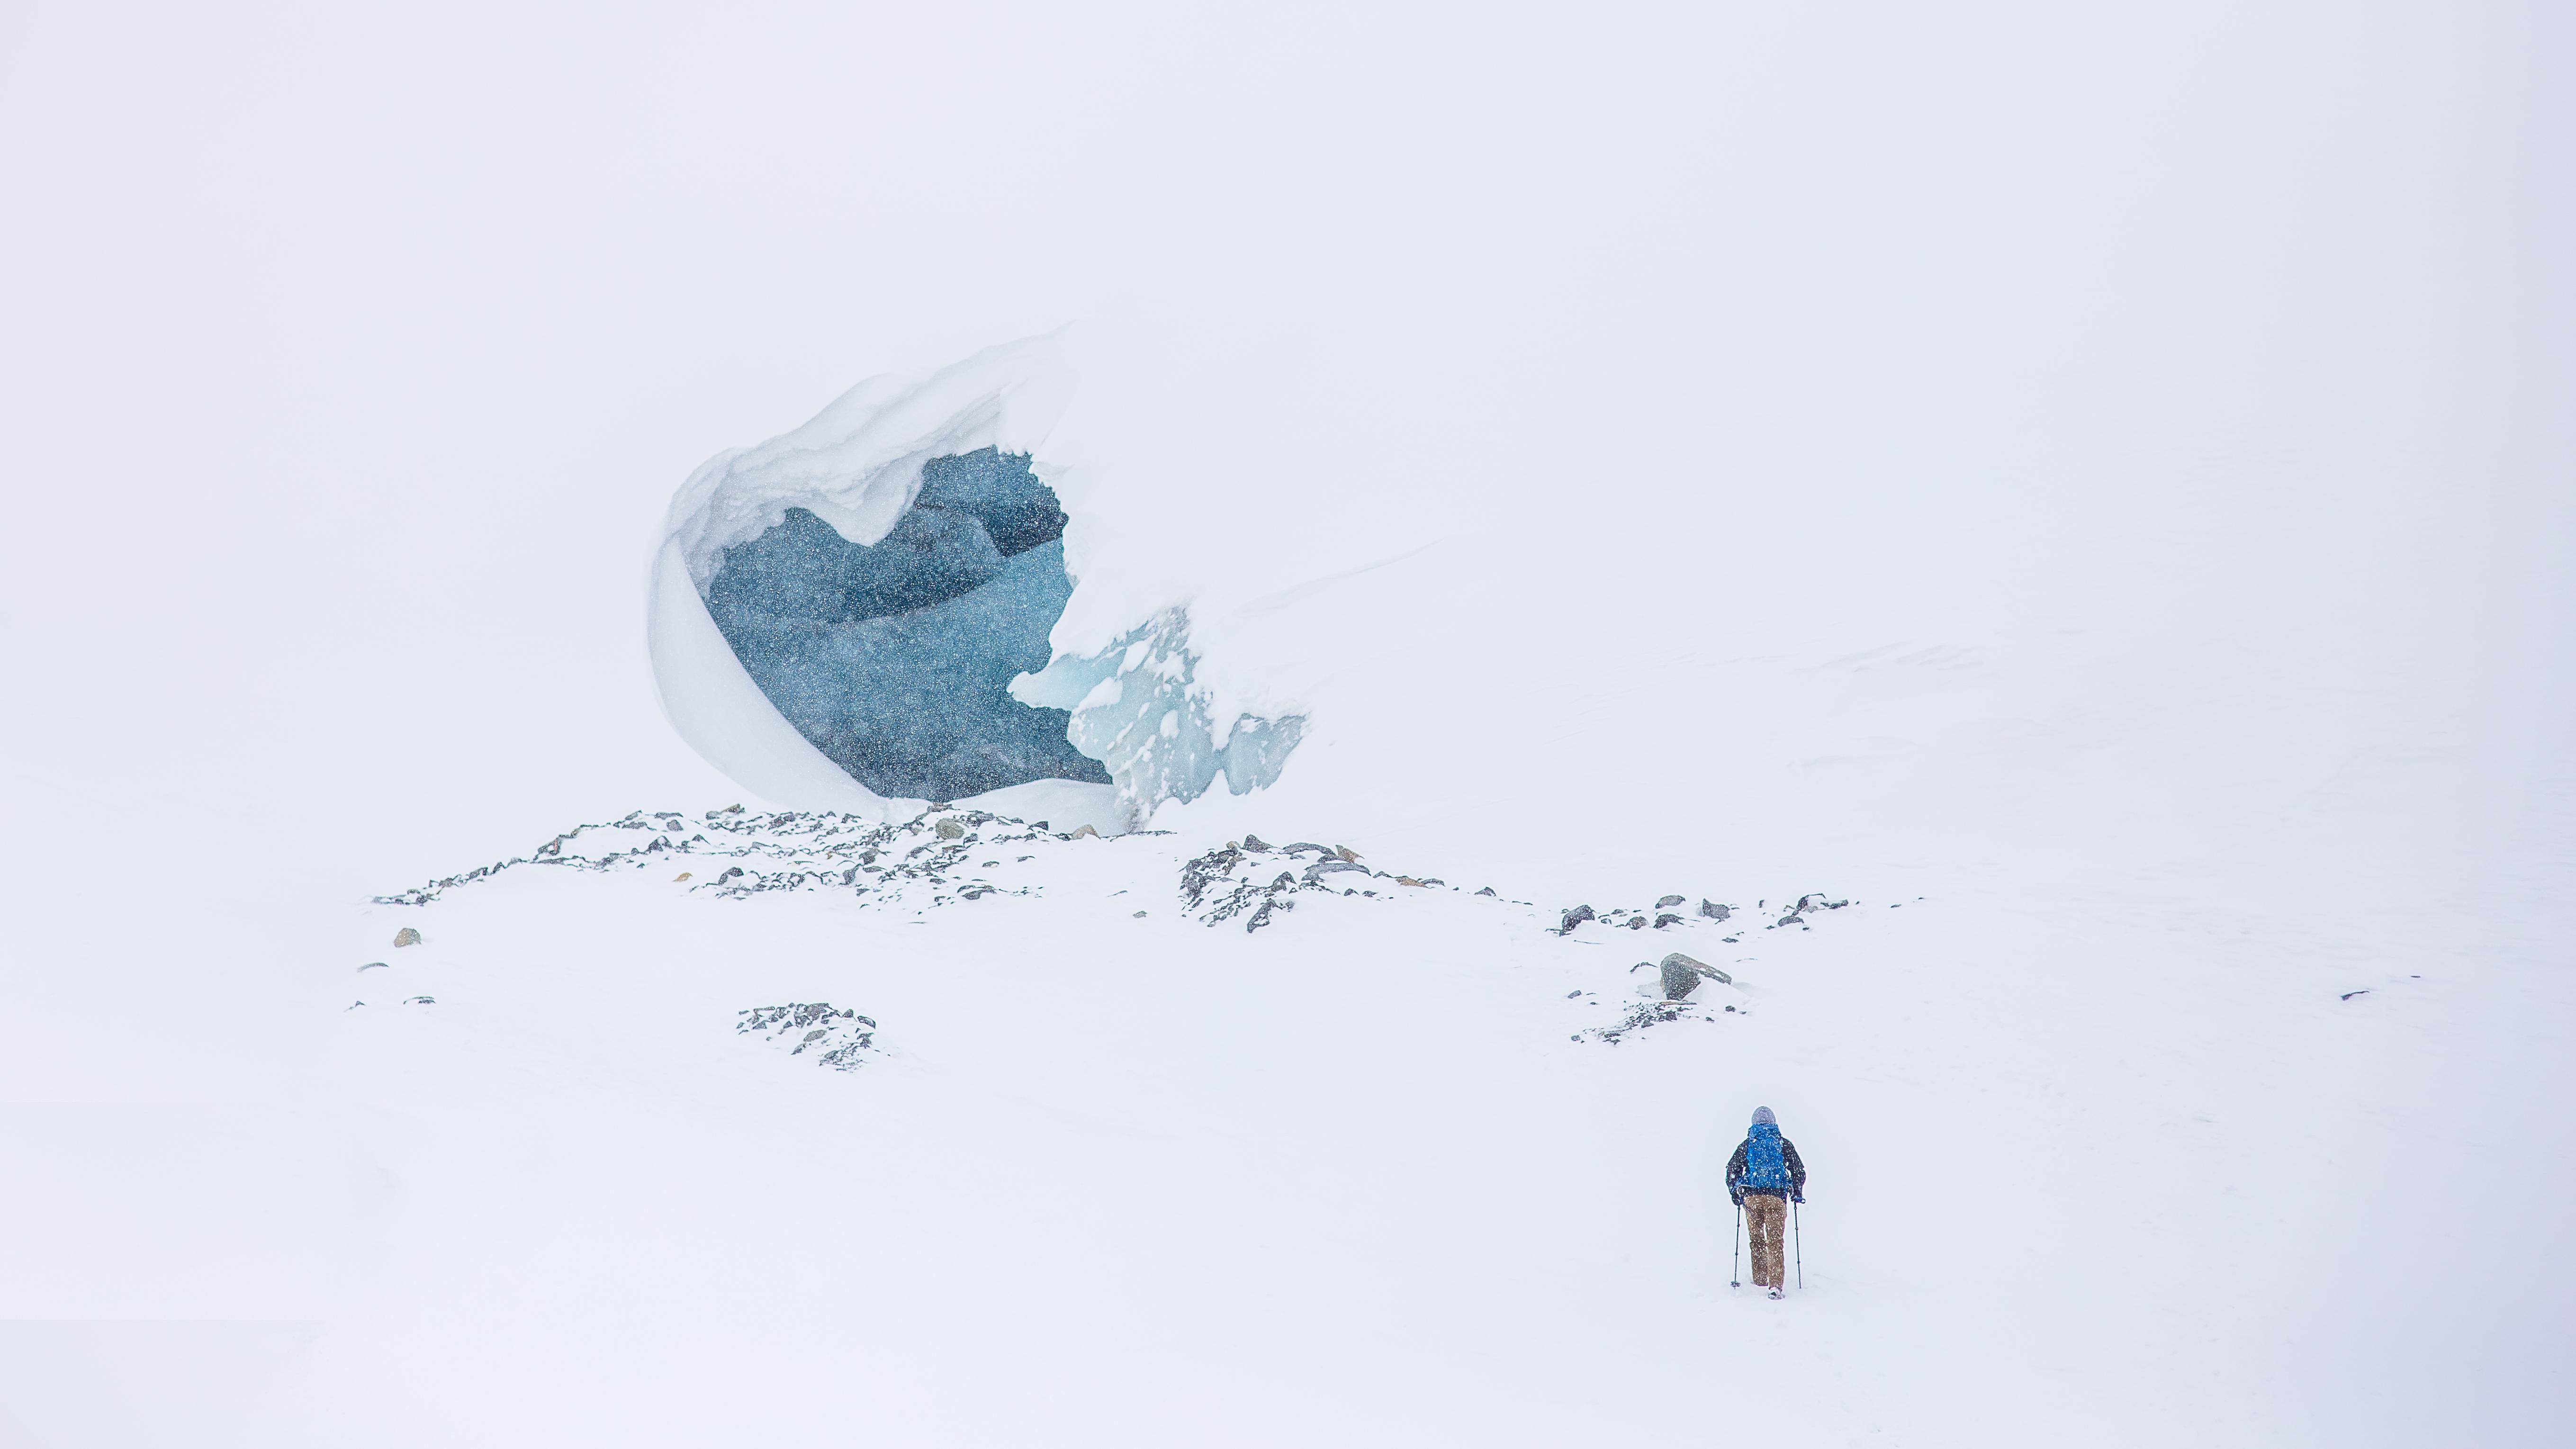 Gambar Salju Musim Dingin Petualangan Es Cuaca Biru